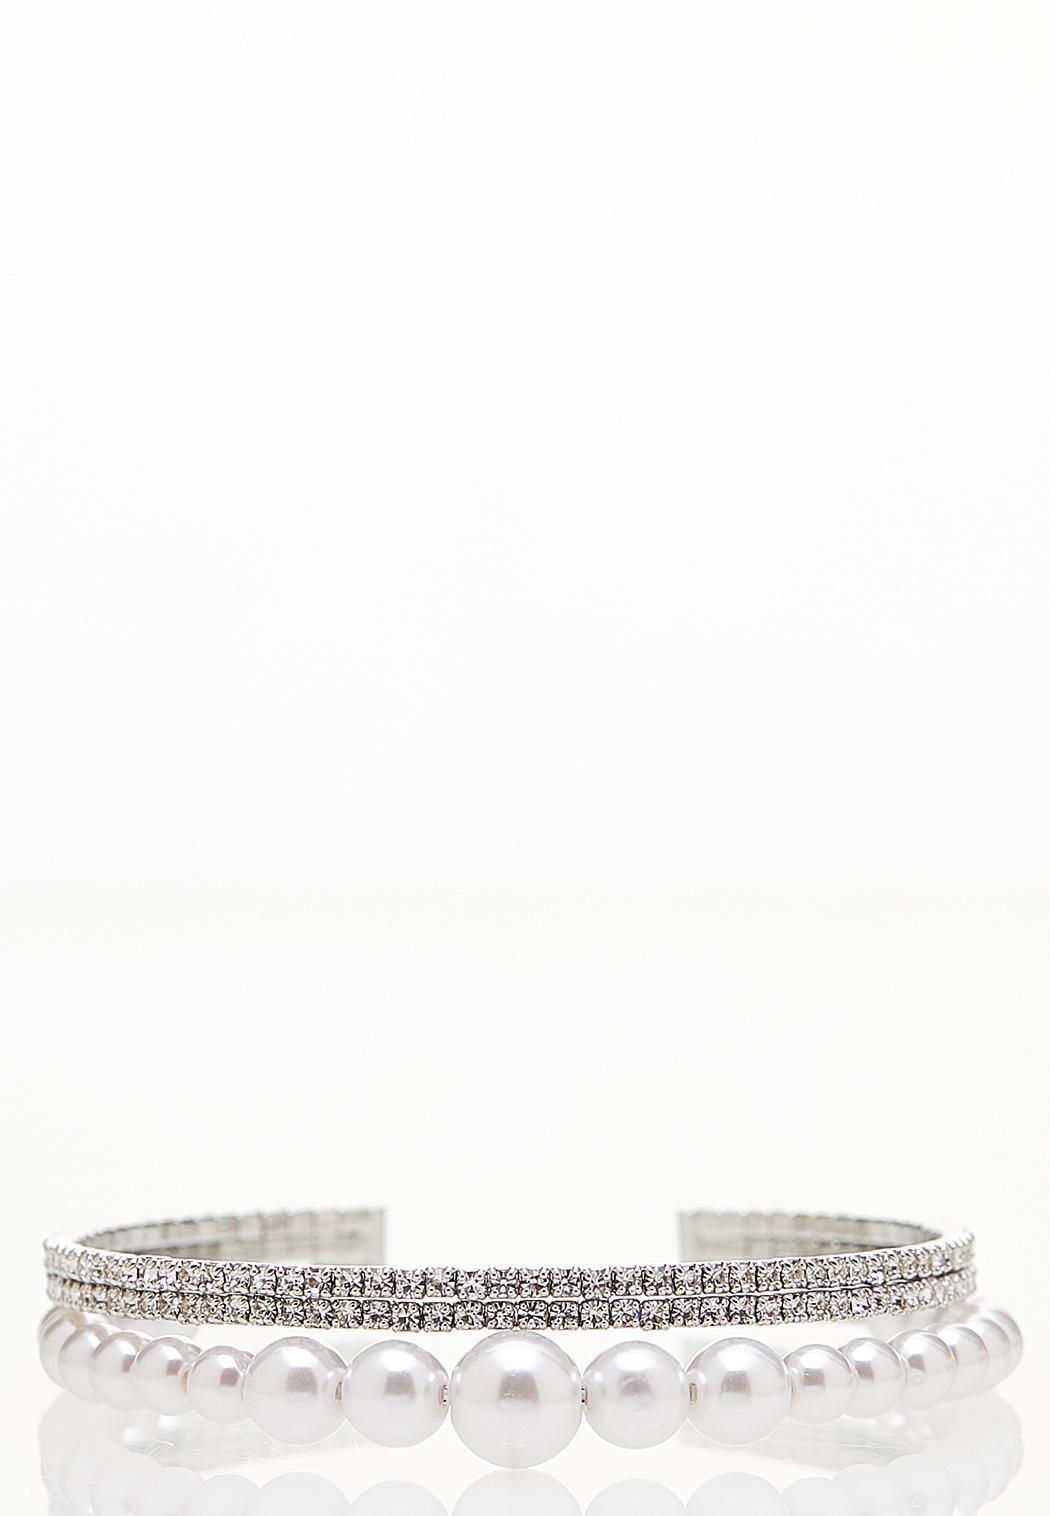 Pearl Rhinestone Flex Cuff Bracelet